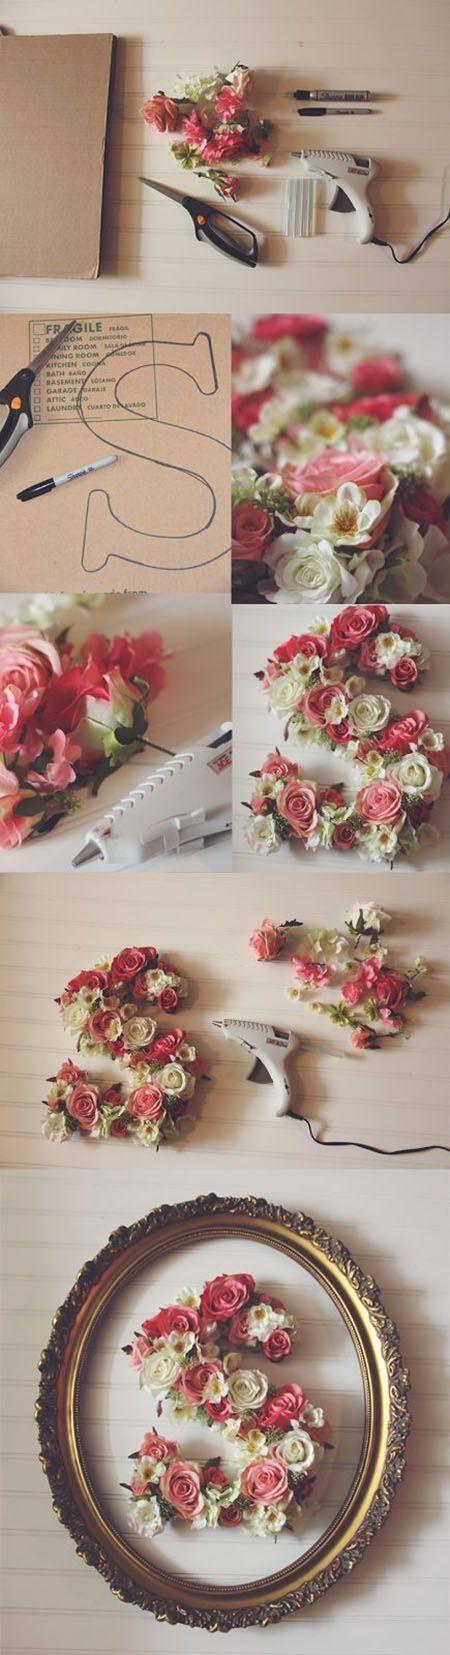 Diy Beautiful Flower Decor: